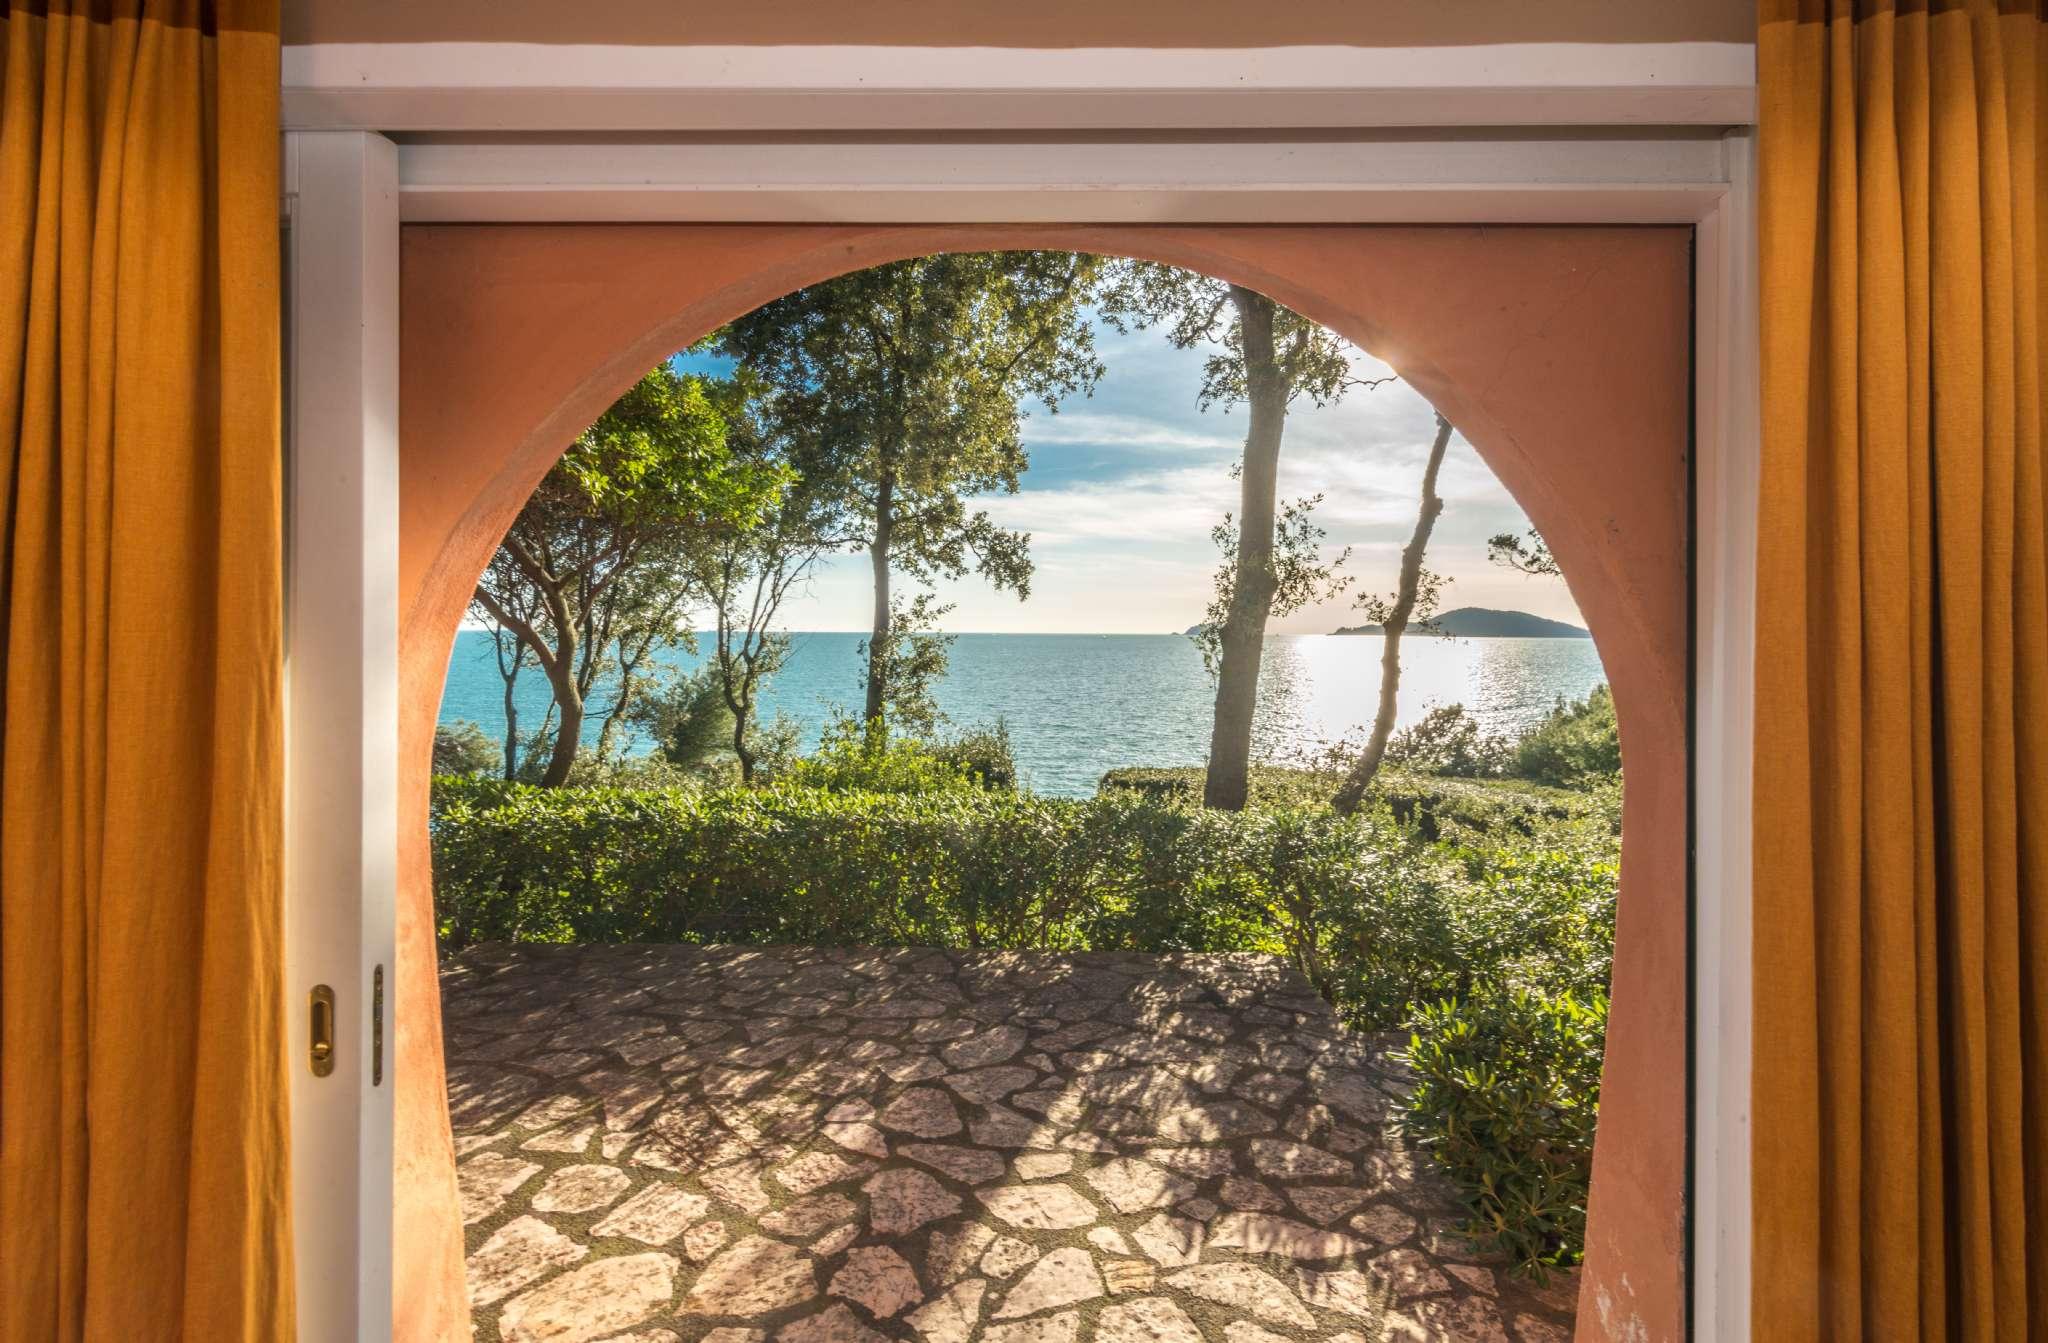 Villa in Vendita a Lerici: 5 locali, 340 mq - Foto 1